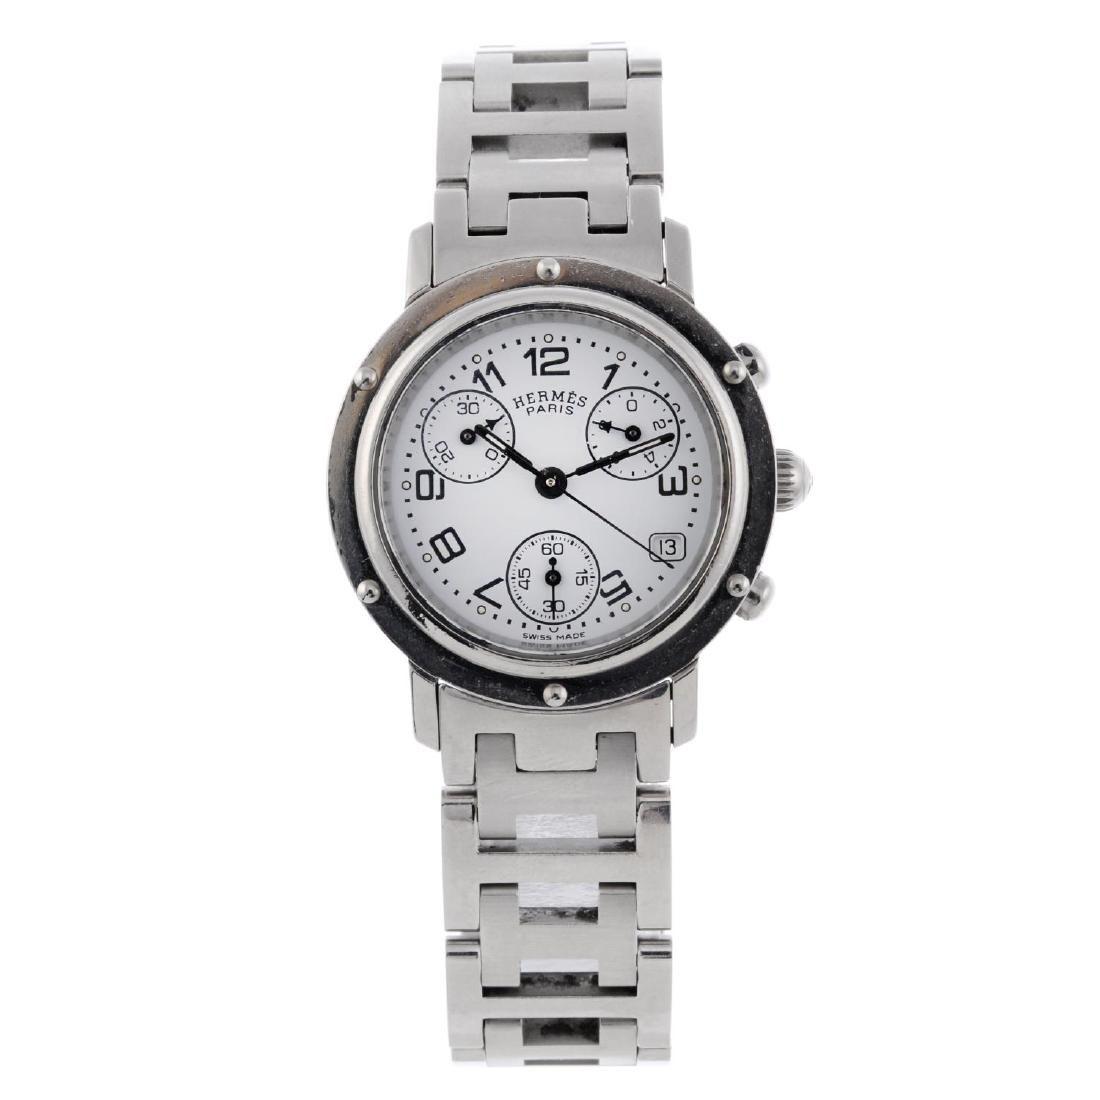 HERMÈS - a lady's Clipper chronograph bracelet watch.